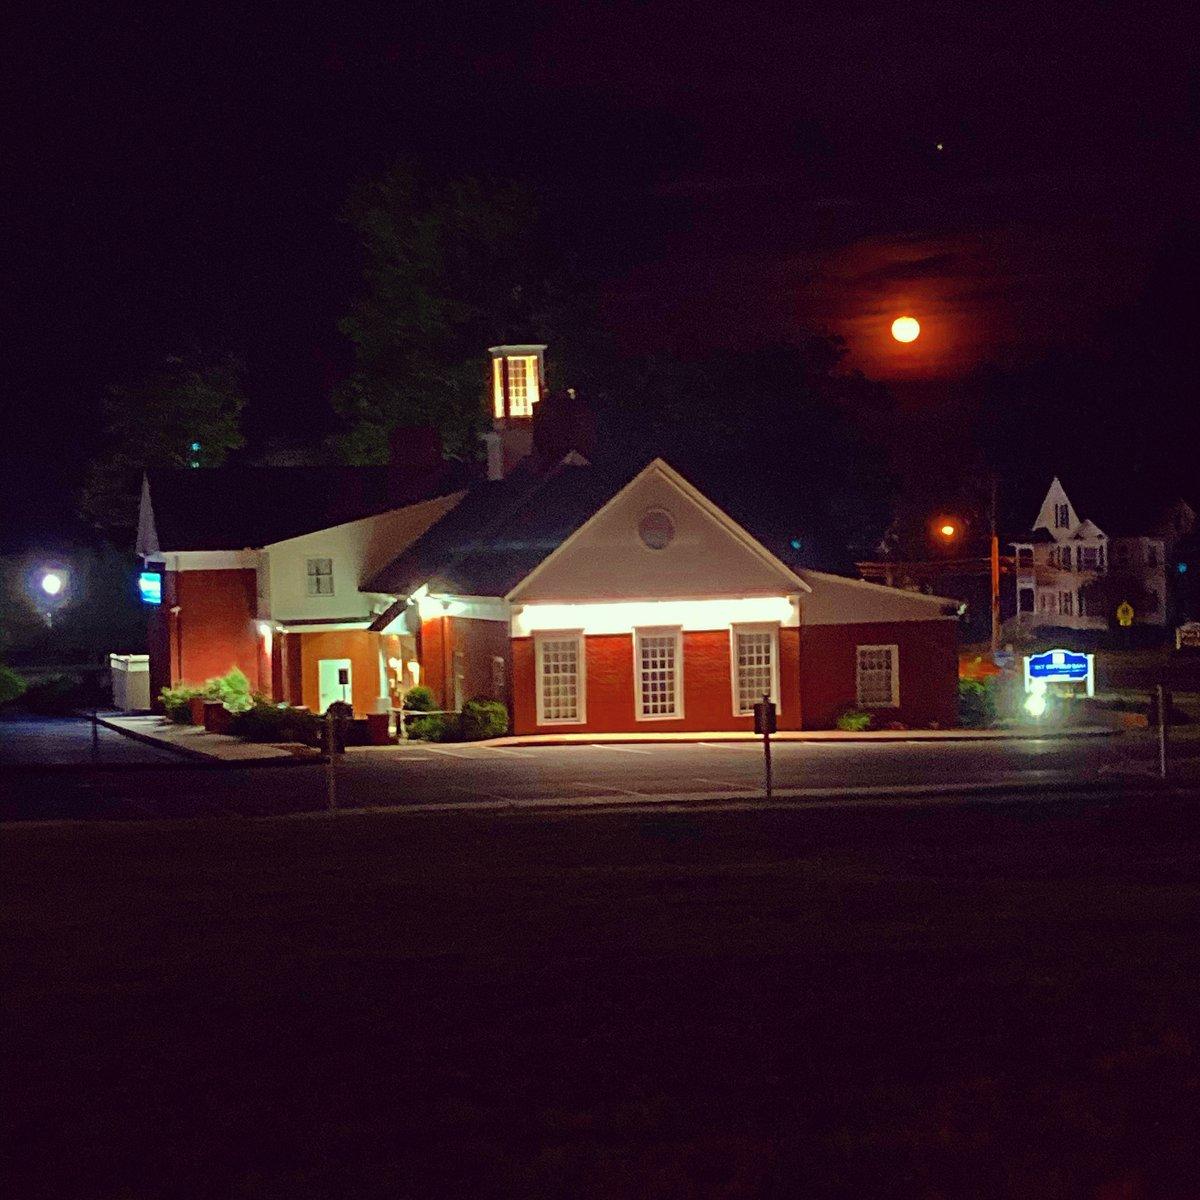 Buck Moon! 🌝🌝🌝  The full moon rises over @FirstSuffield.  @BankAtPeoples #Summer #Buck #Moon #BuckMoon #Full #FullMoon #Bank #FirstSuffieldBank #Suffield #Connecticut